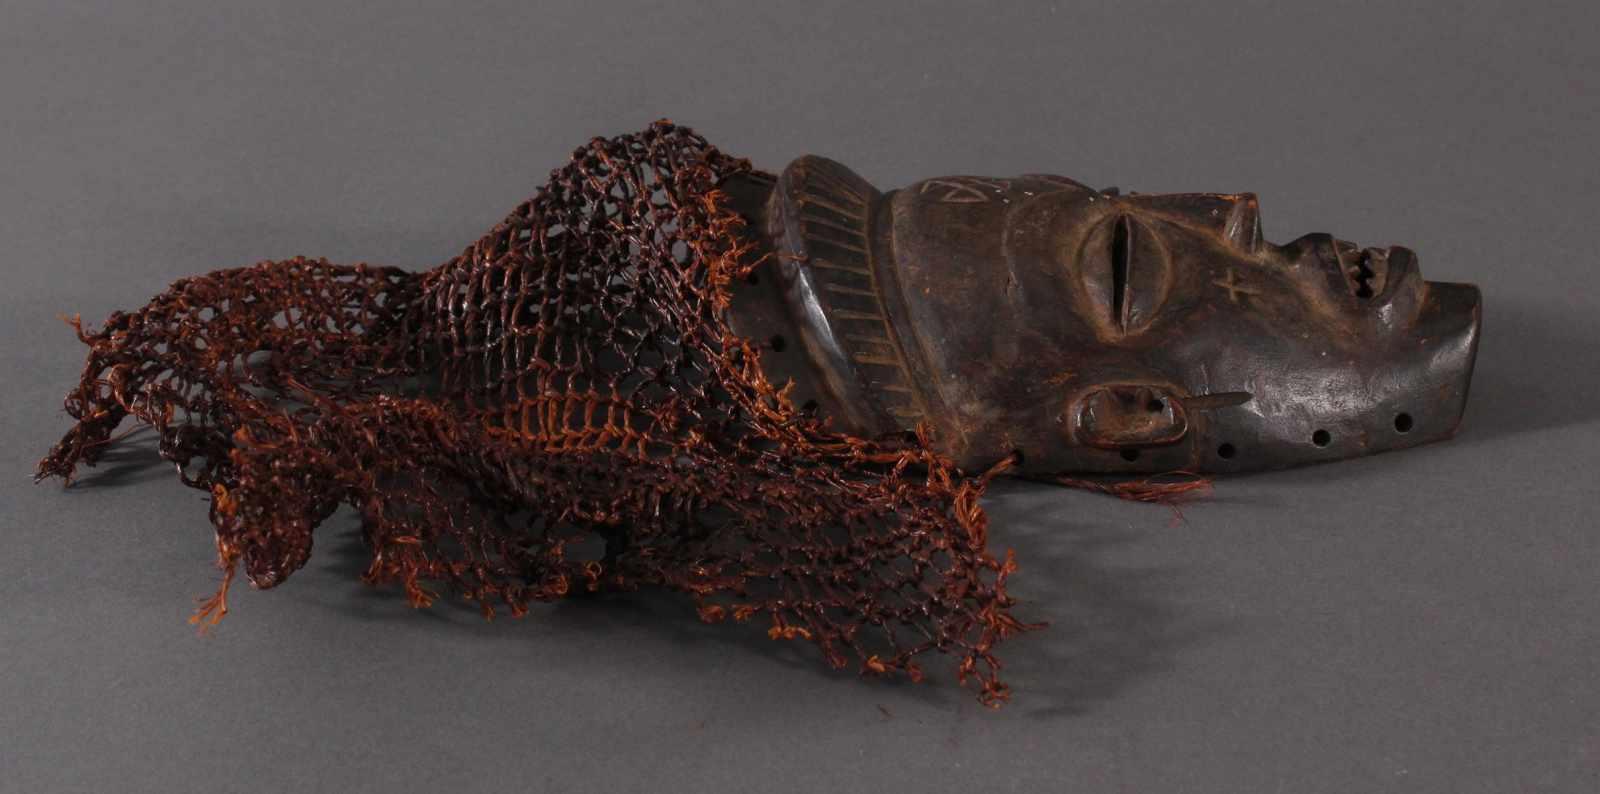 Antike Maske, Chokwe, Kongo 1.Hälfte 20. Jh.Holz geschnitzt, dunkle Patina, Narbenschmuck, - Bild 2 aus 4